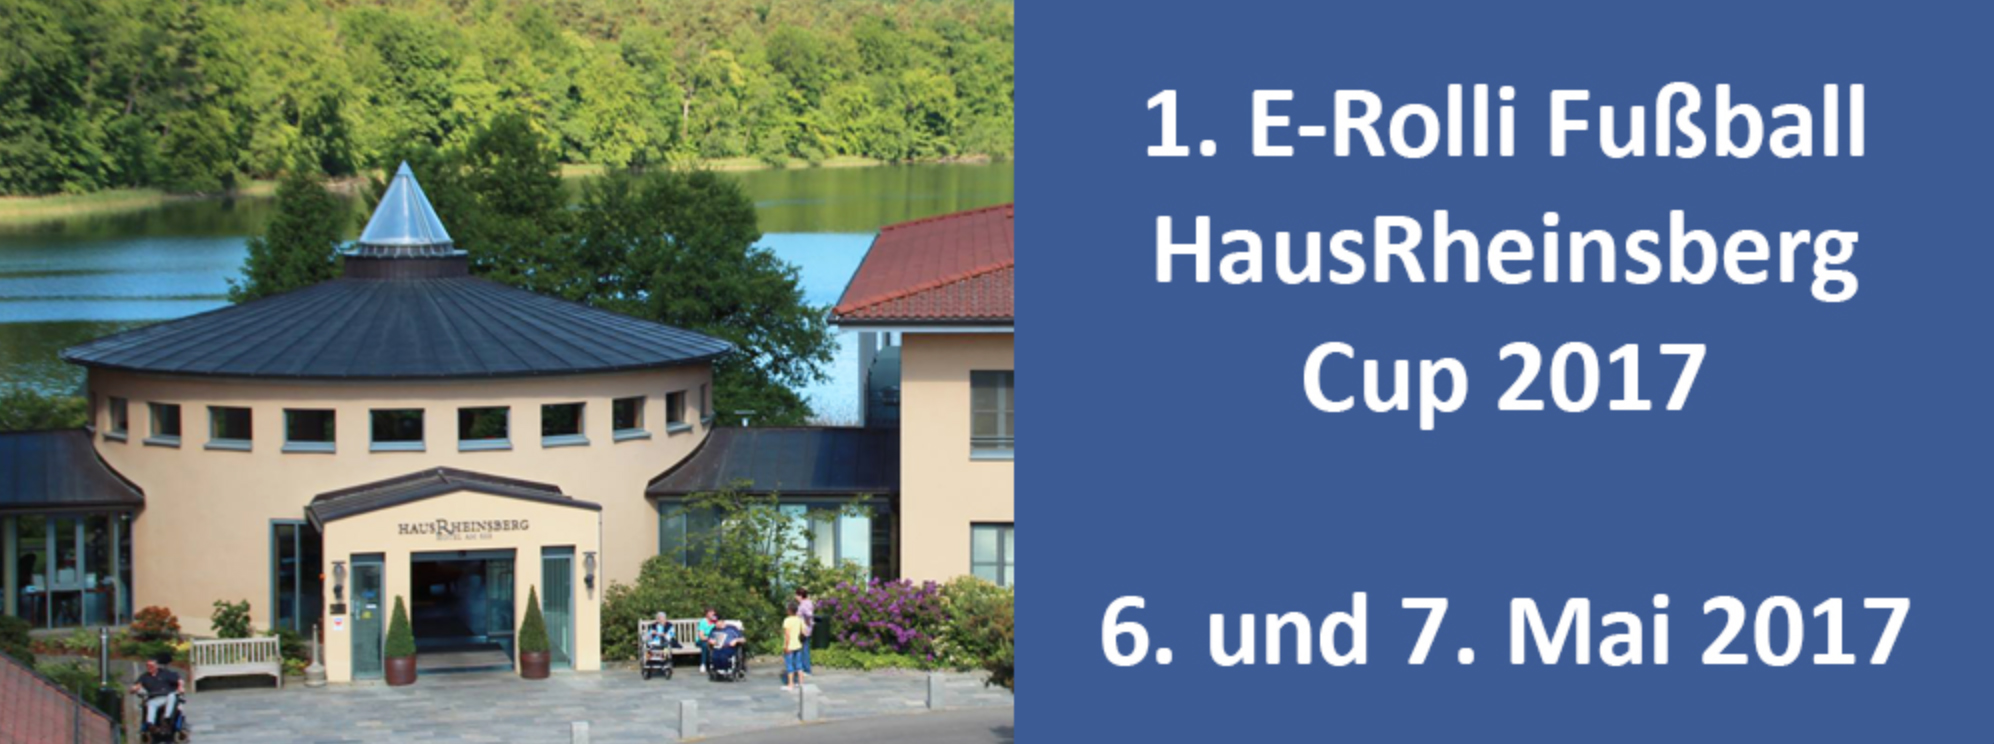 1. E-Rolli Fußball HausRheinsberg Cup 2017